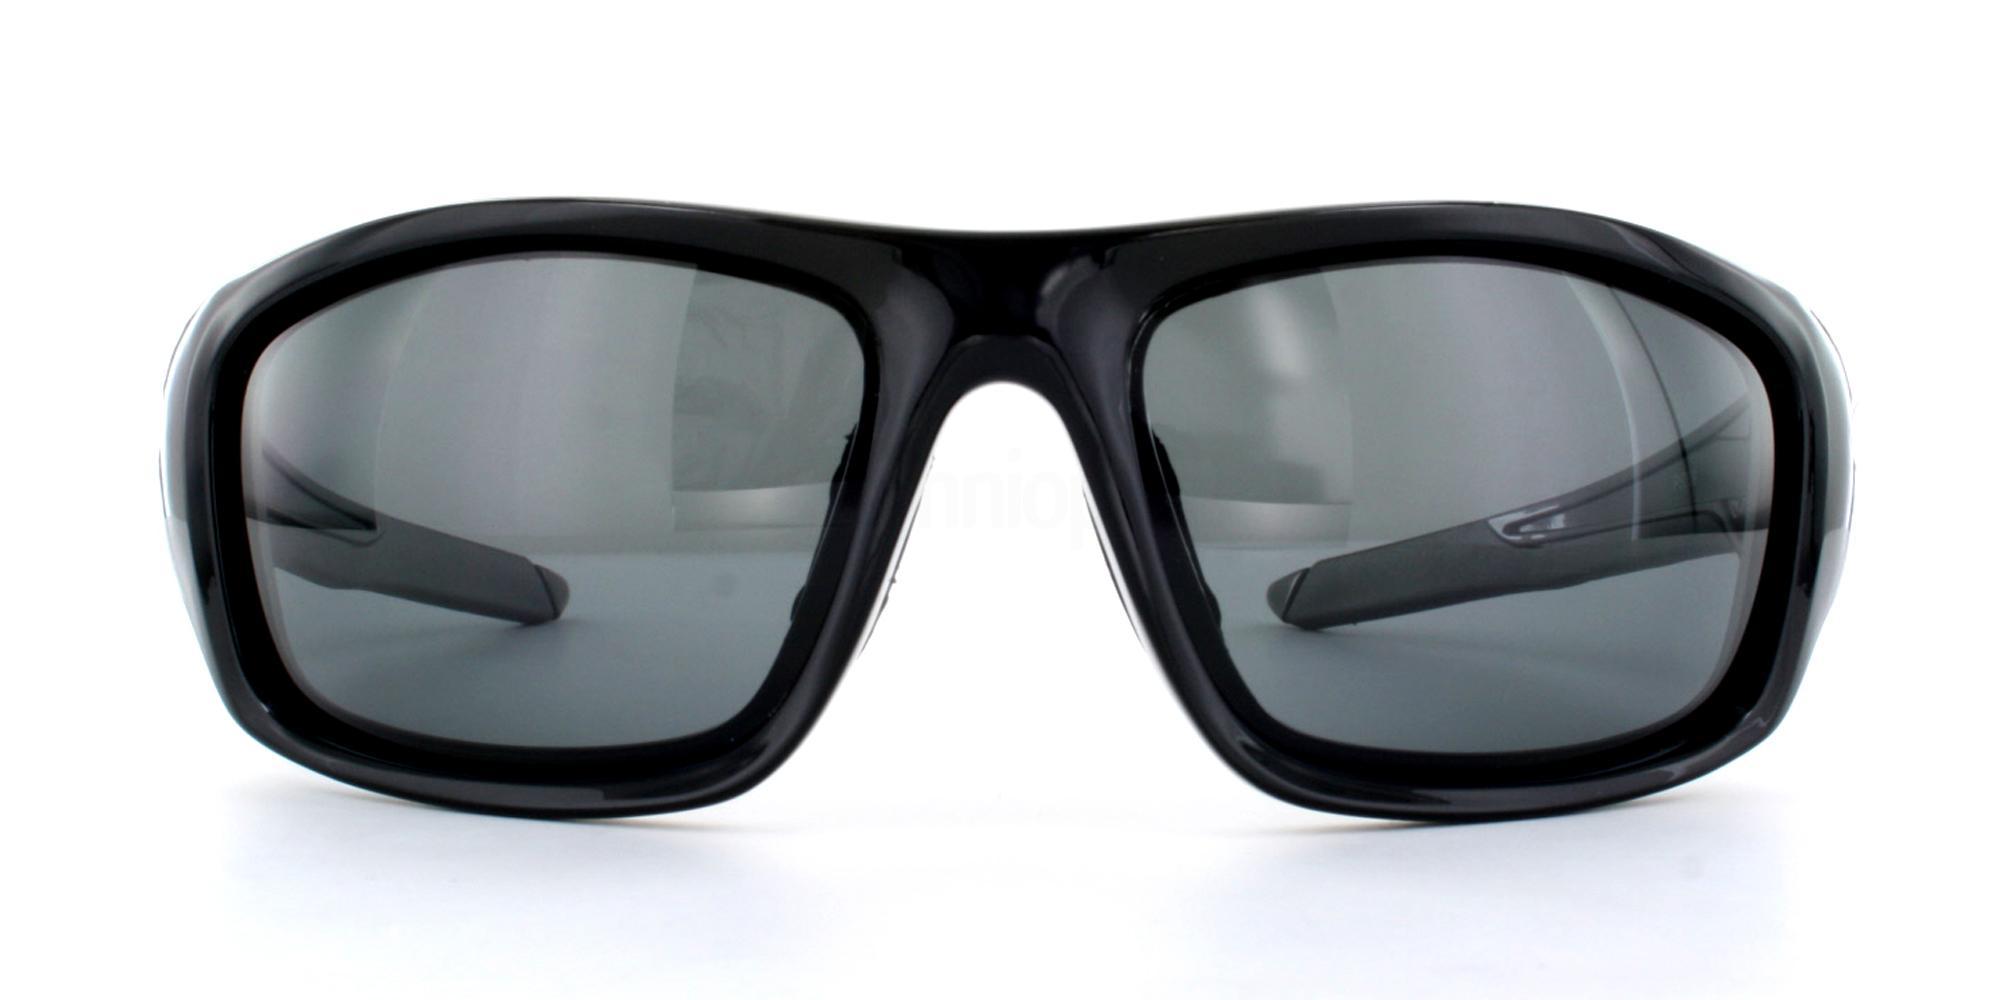 Shiny Black + Grey Lens P5009 Sunglasses, Aero